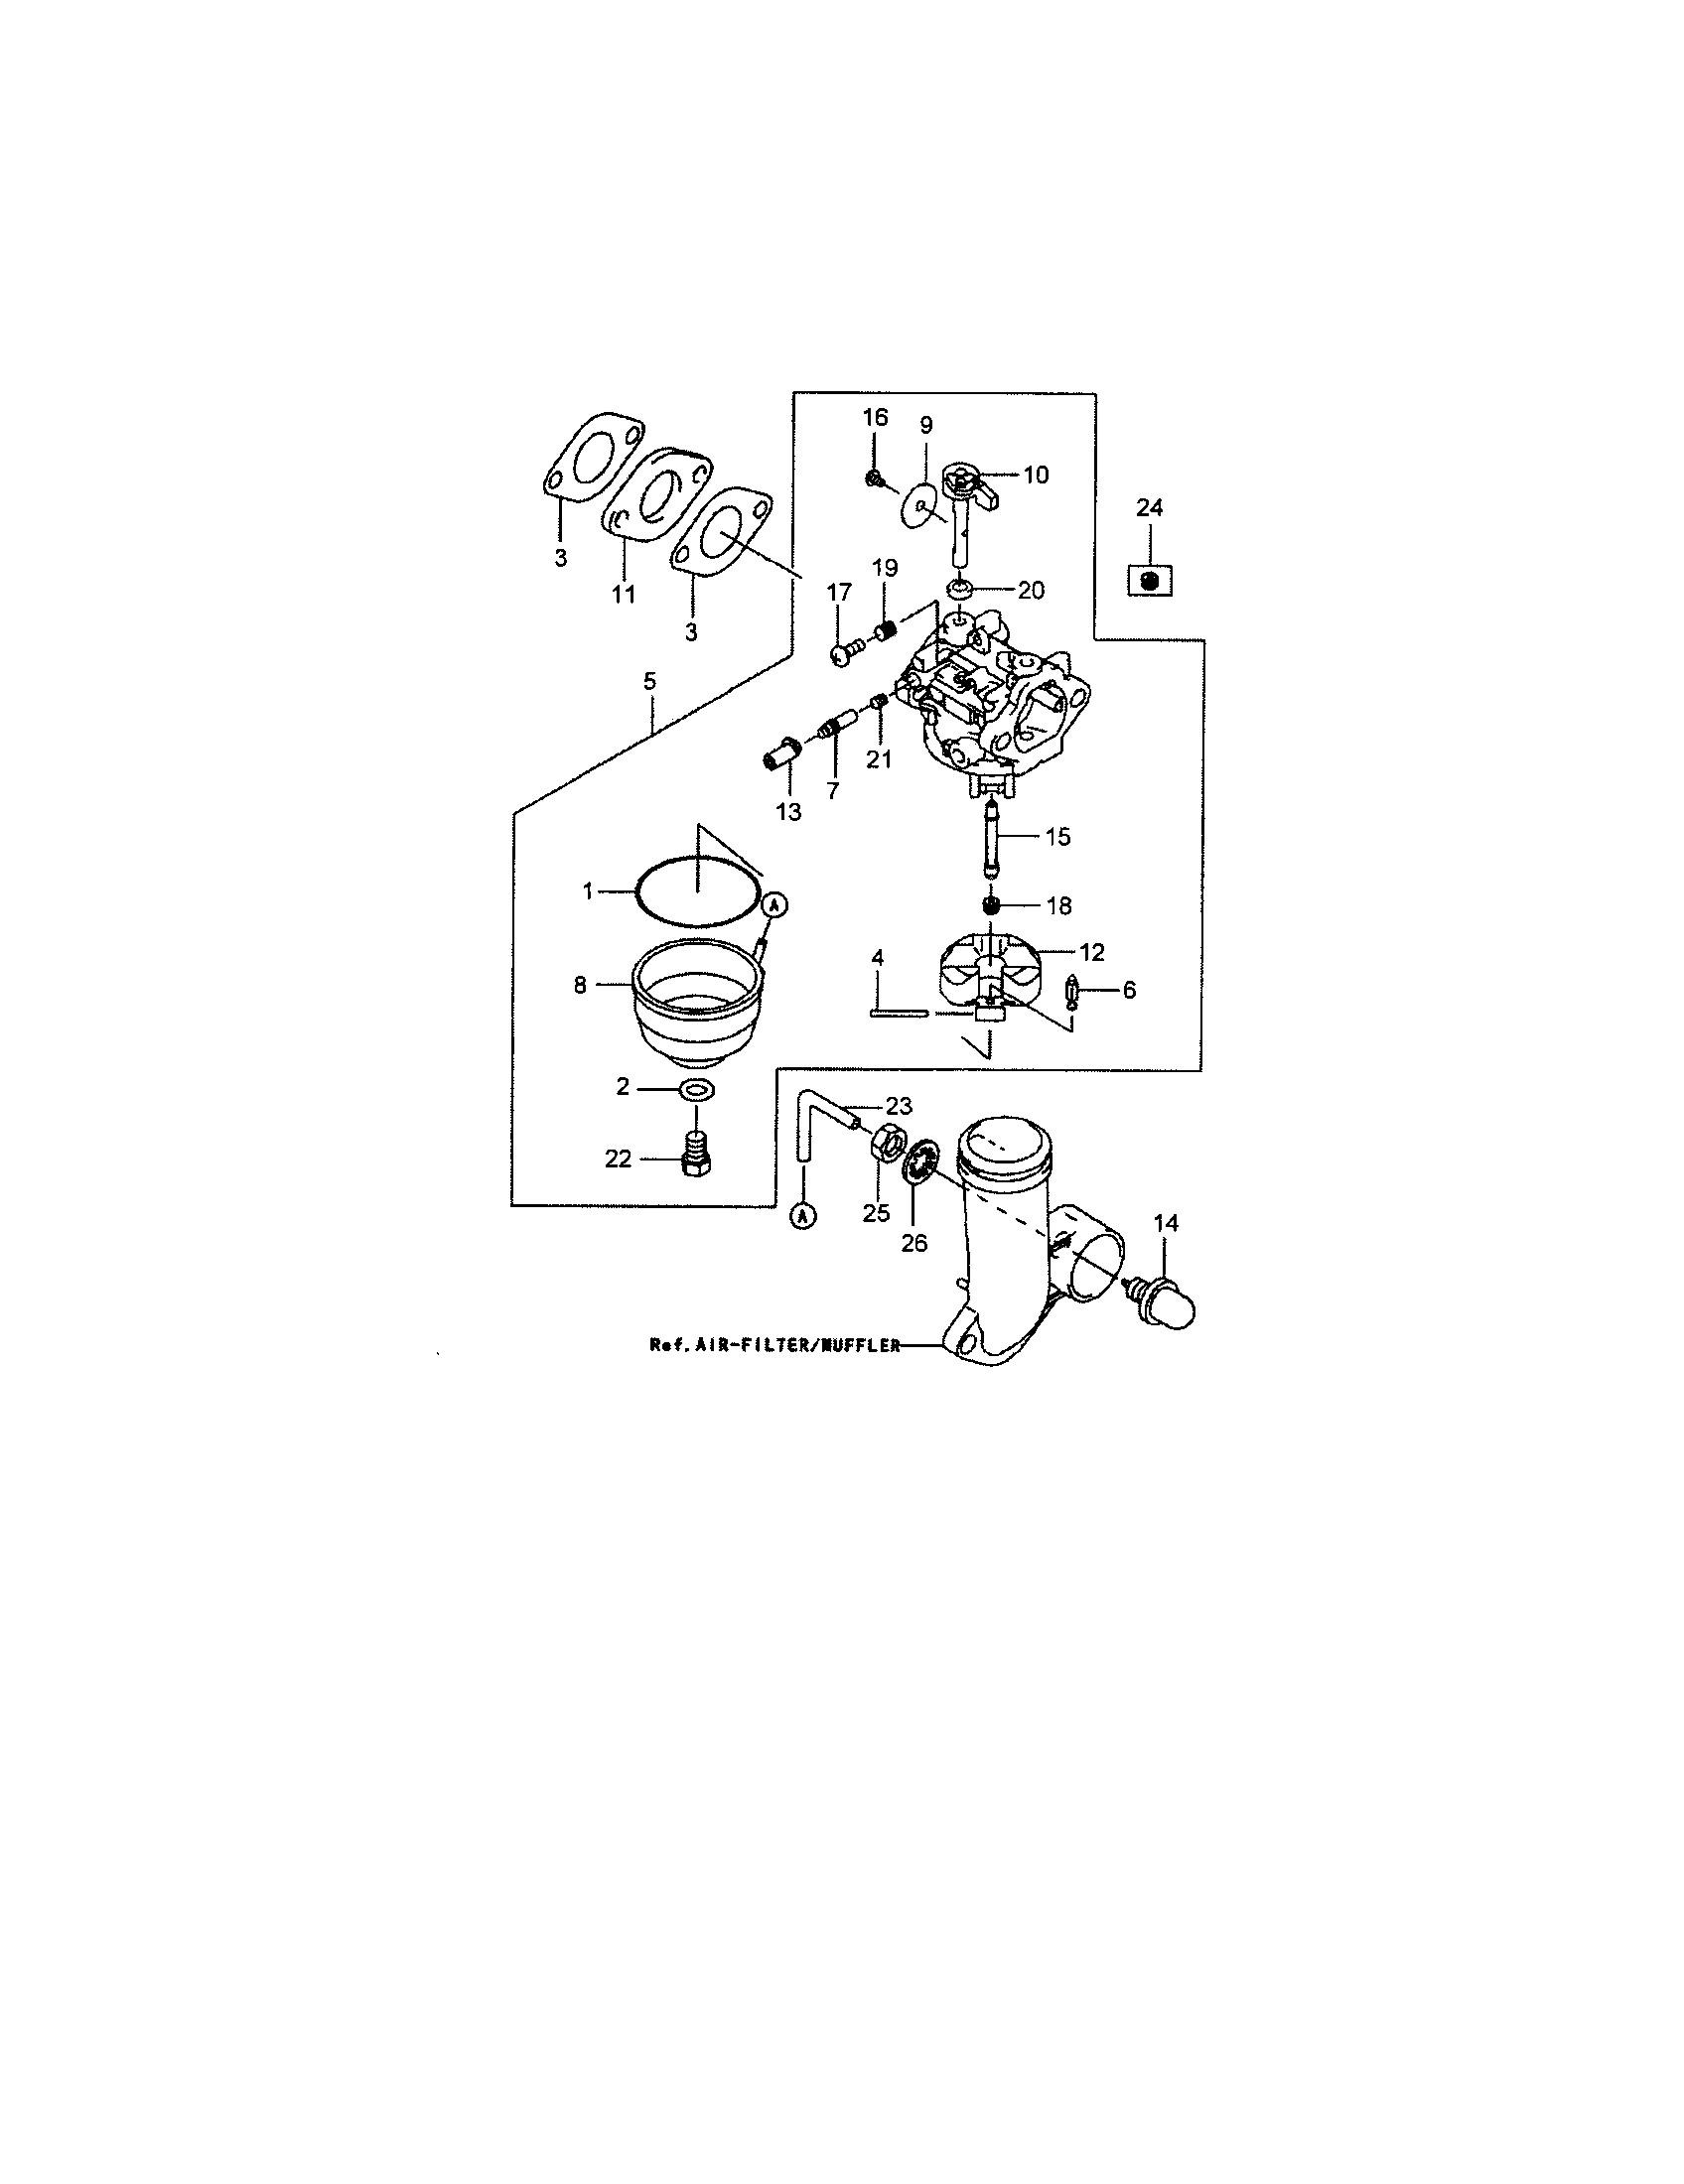 Craftsman Lawn Mower Engine Parts Diagram Craftsman 19 5